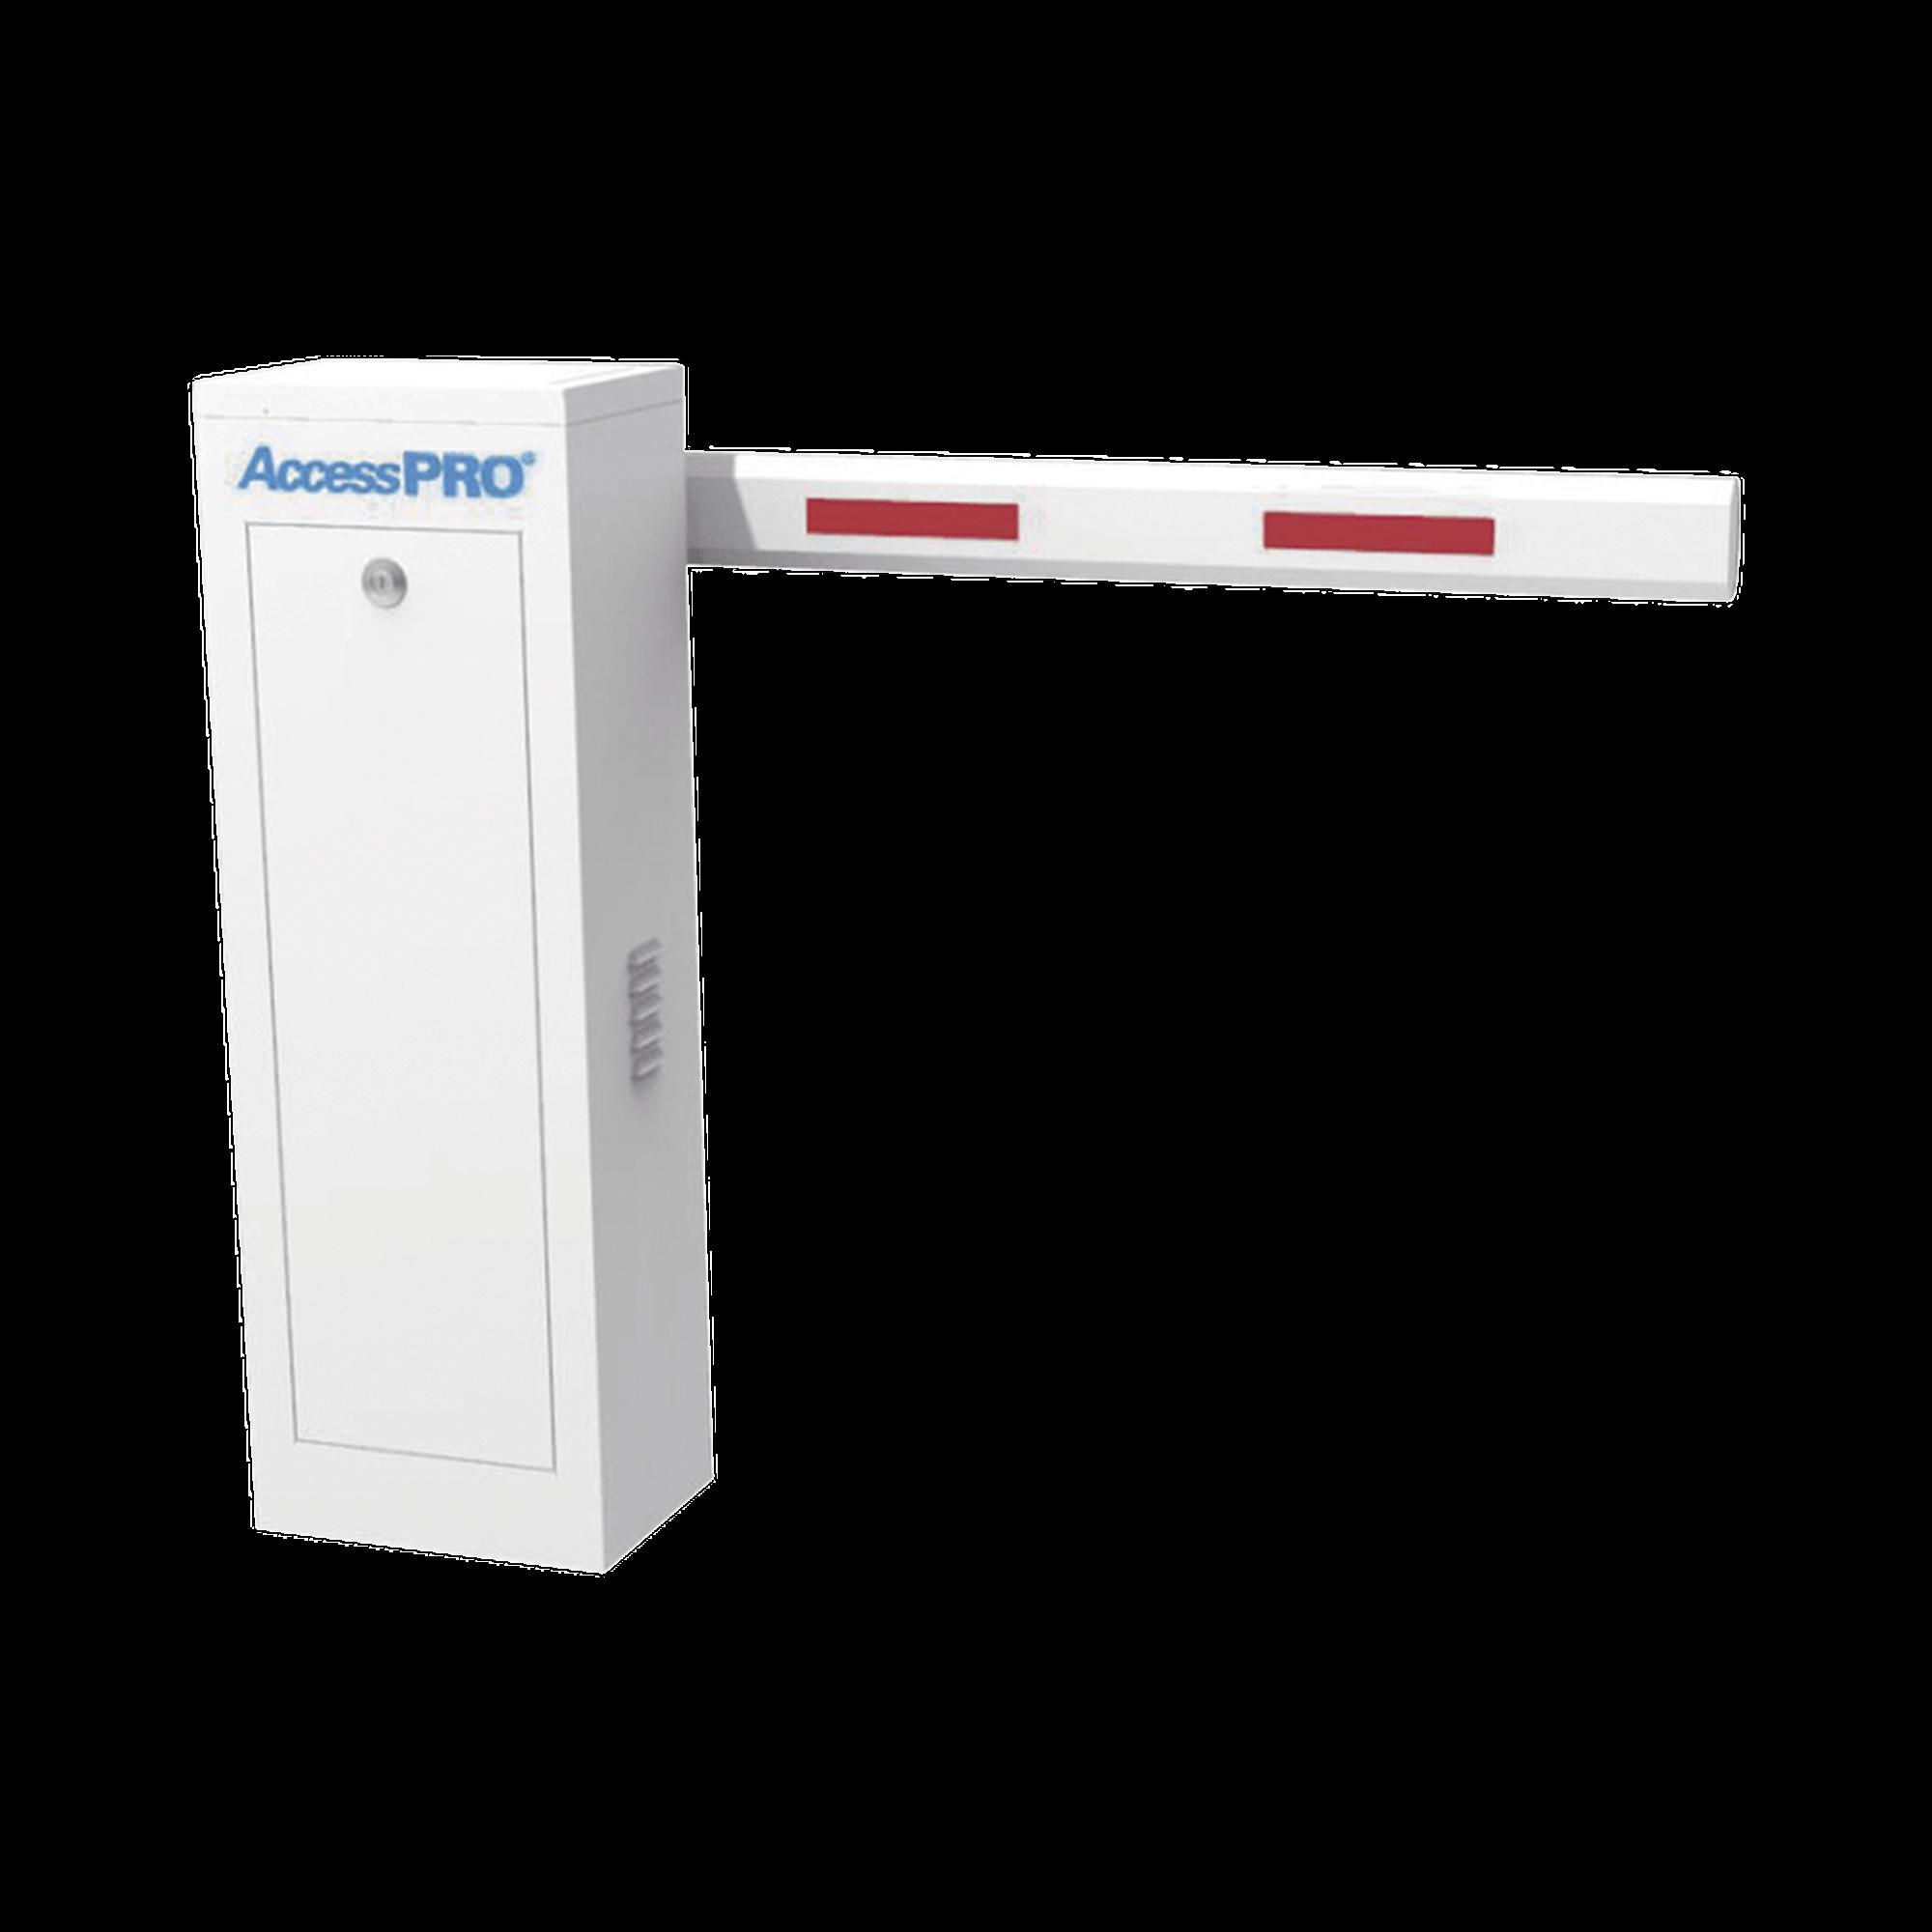 Kit de Barrera Vehicular Derecha con Brazo Telescópico / Soporta brazo Telescópico de hasta 6 metros / Tiempo de Apertura 6 segundos